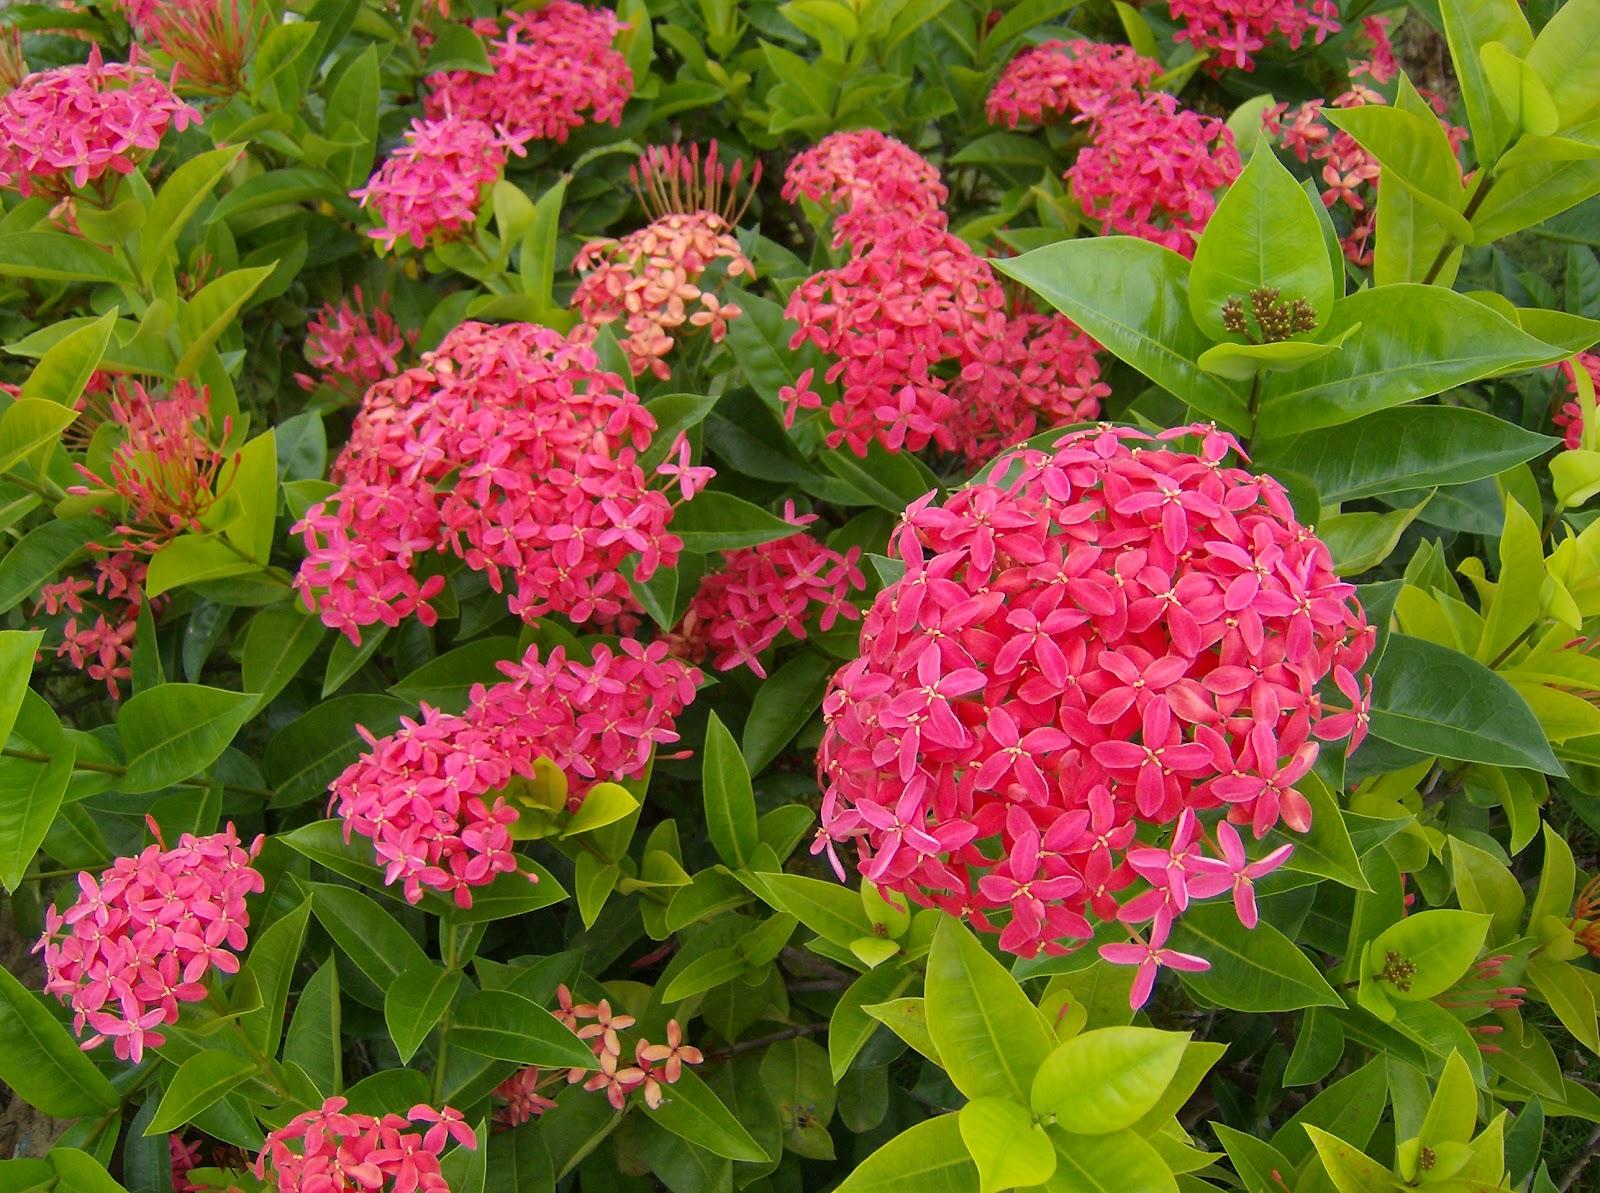 Jenis Tanaman Dan Manfaatnya Cara Menanam Dan Merawat Bunga Asoka Dengan Mudah